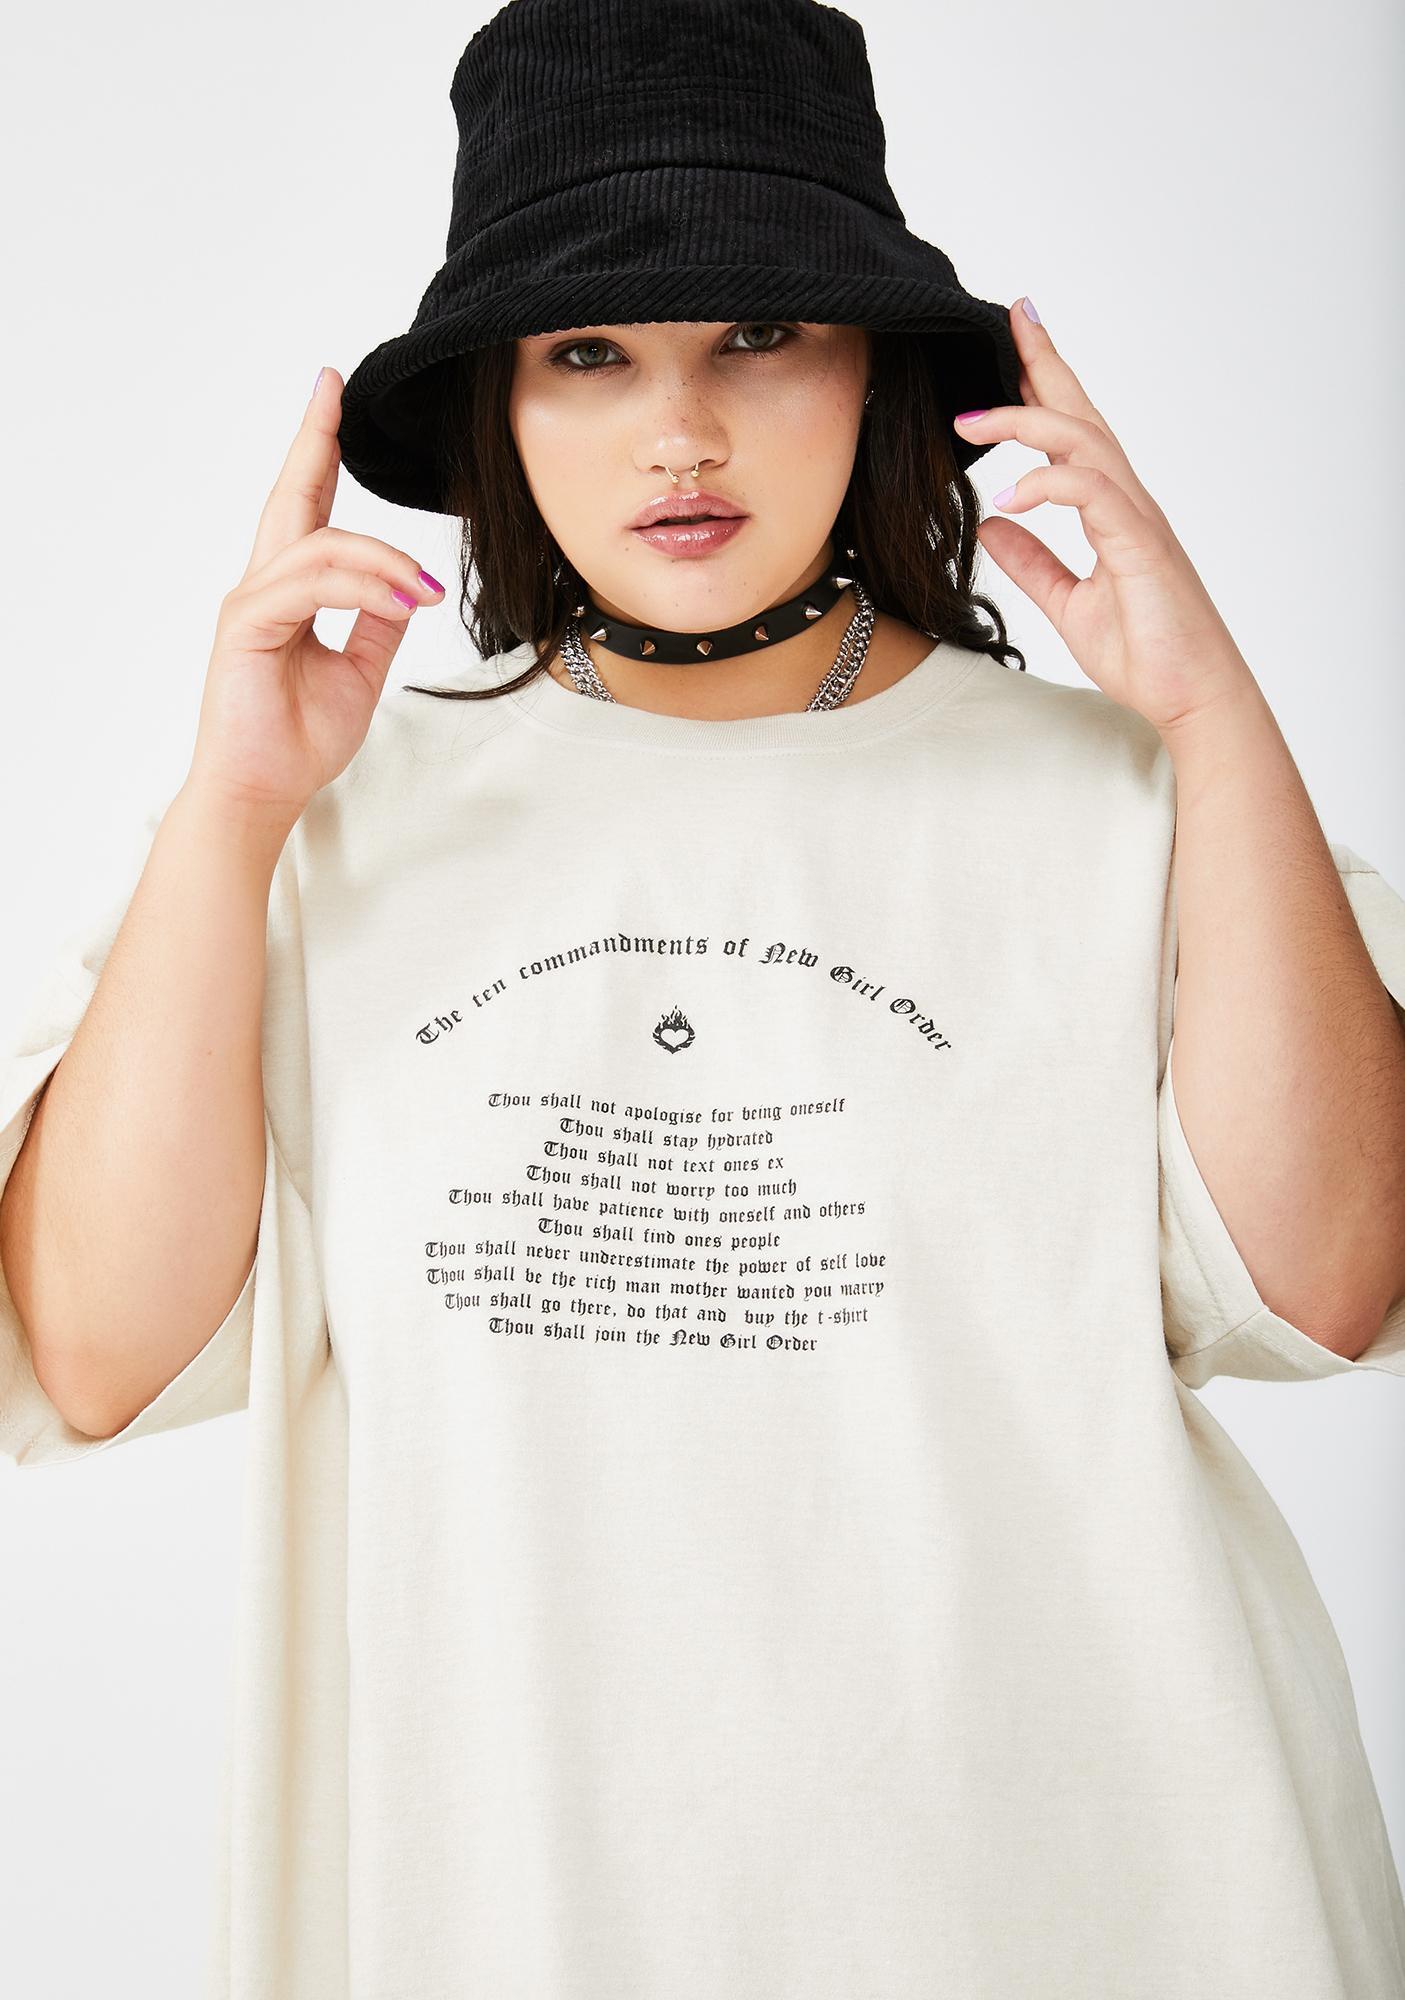 NEW GIRL ORDER Plus Commandments Graphic Tee